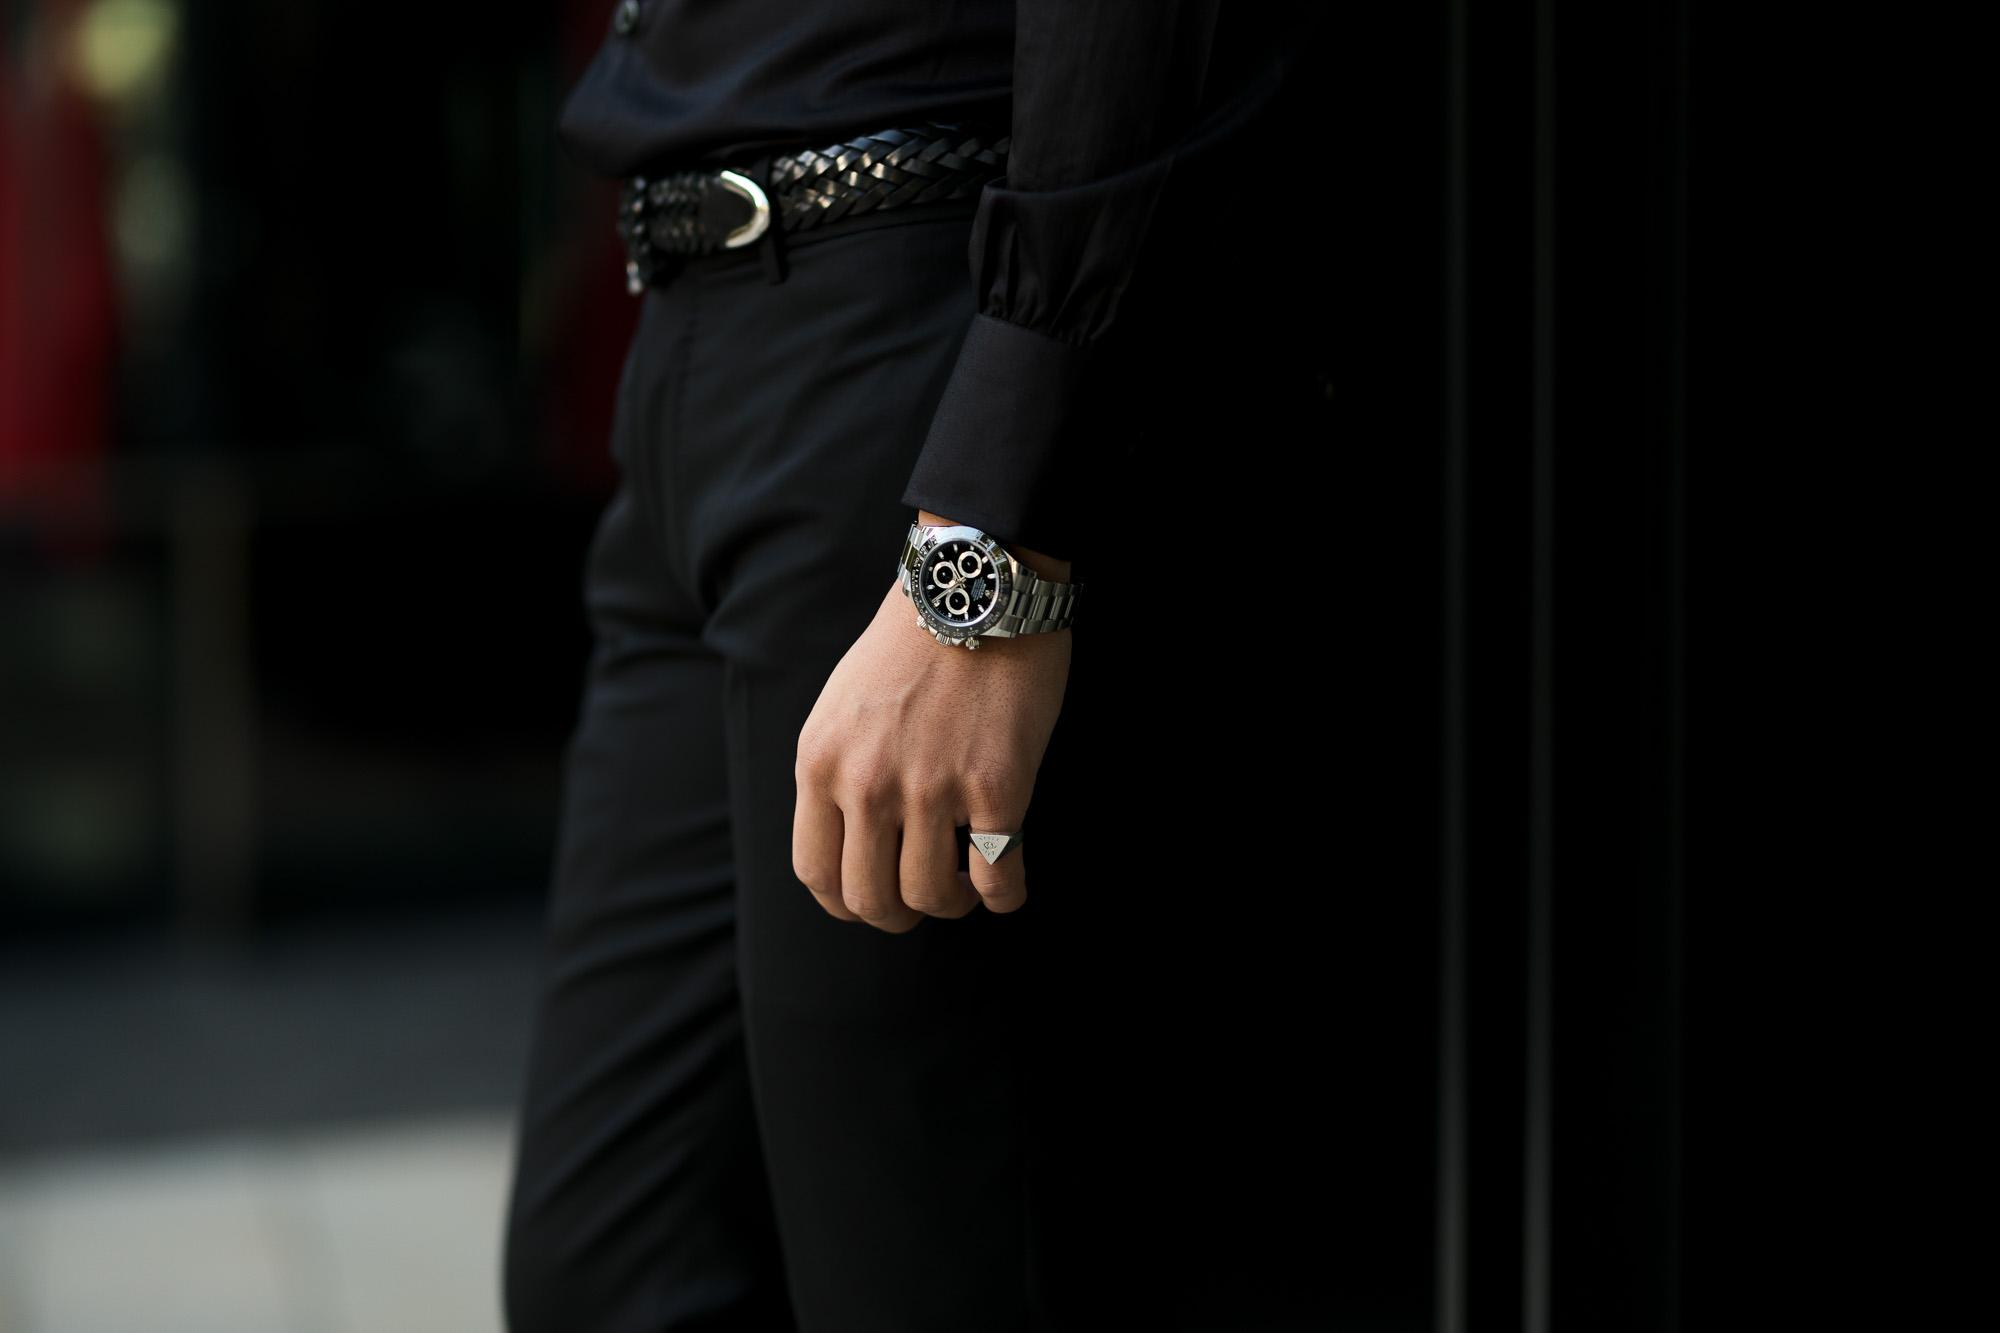 FIXER(フィクサー) ILLUMINATI EYES RING 18K WHITE GOLD イルミナティ アイズリング WHITE GOLD(ホワイトゴールド) 【ご予約受付中】愛知 名古屋 altoediritto アルトエデリット